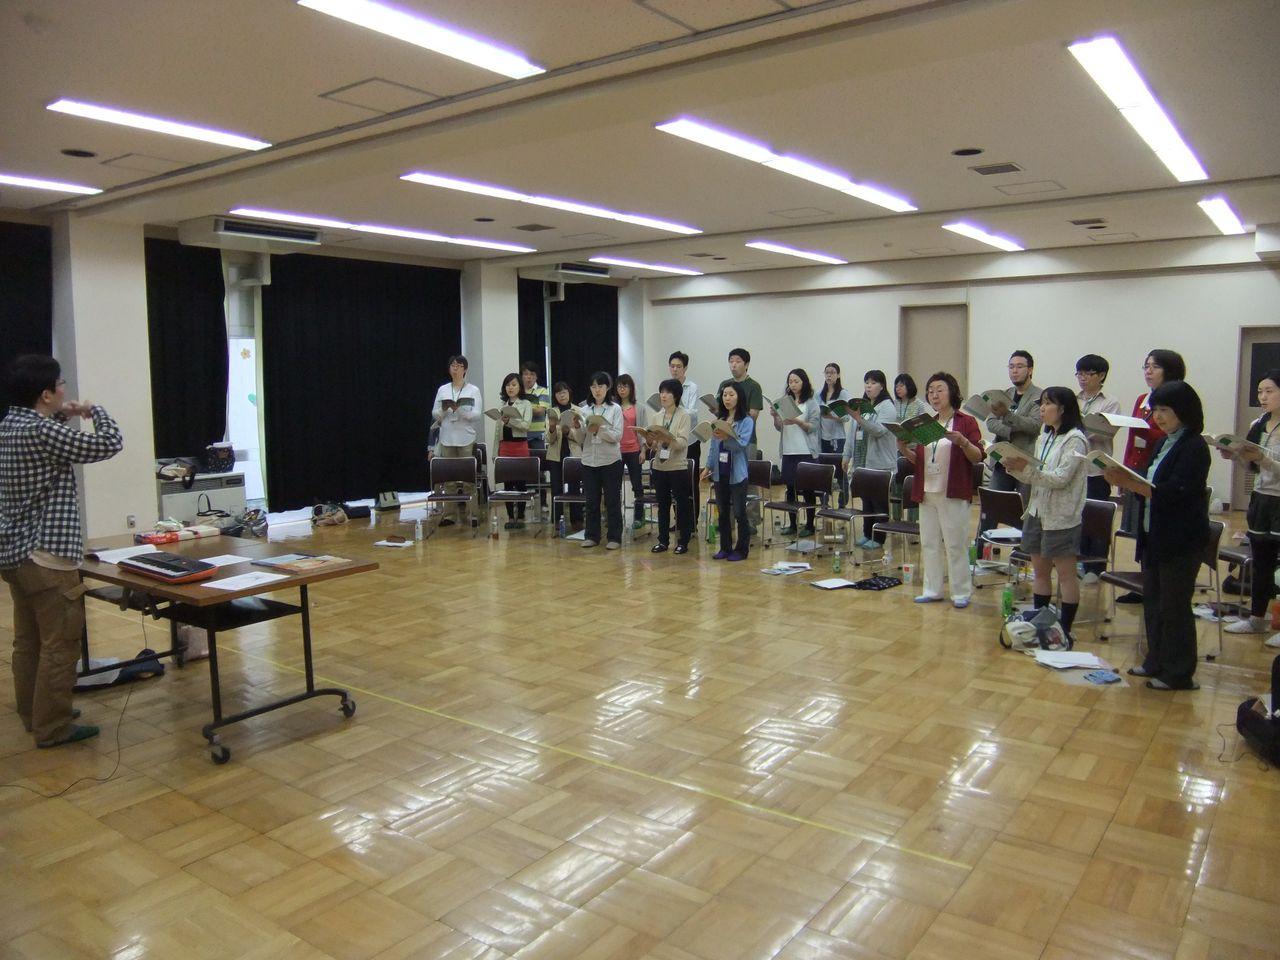 chorus_20130512_003